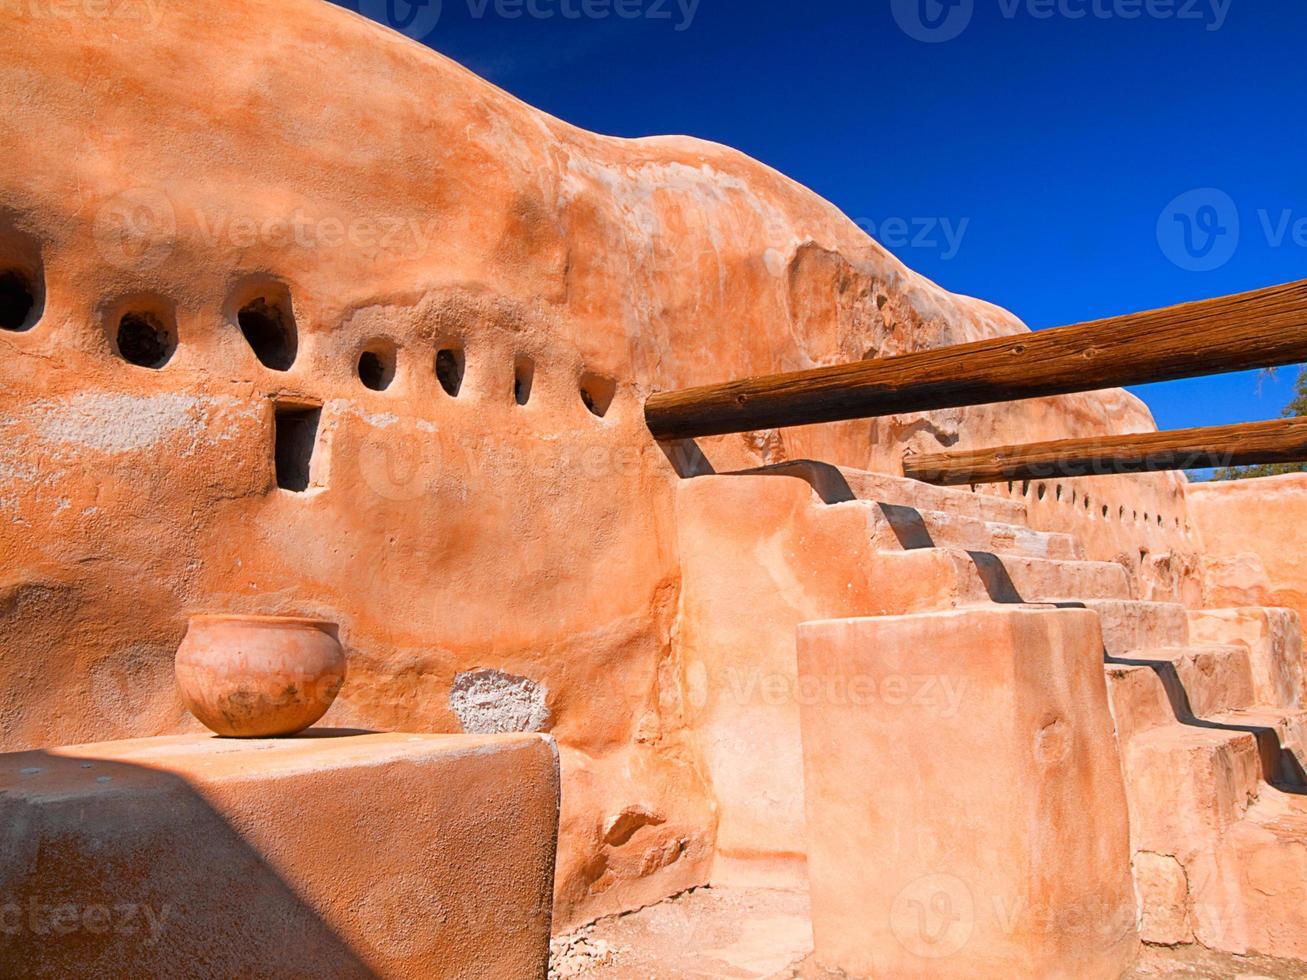 The ruins photo